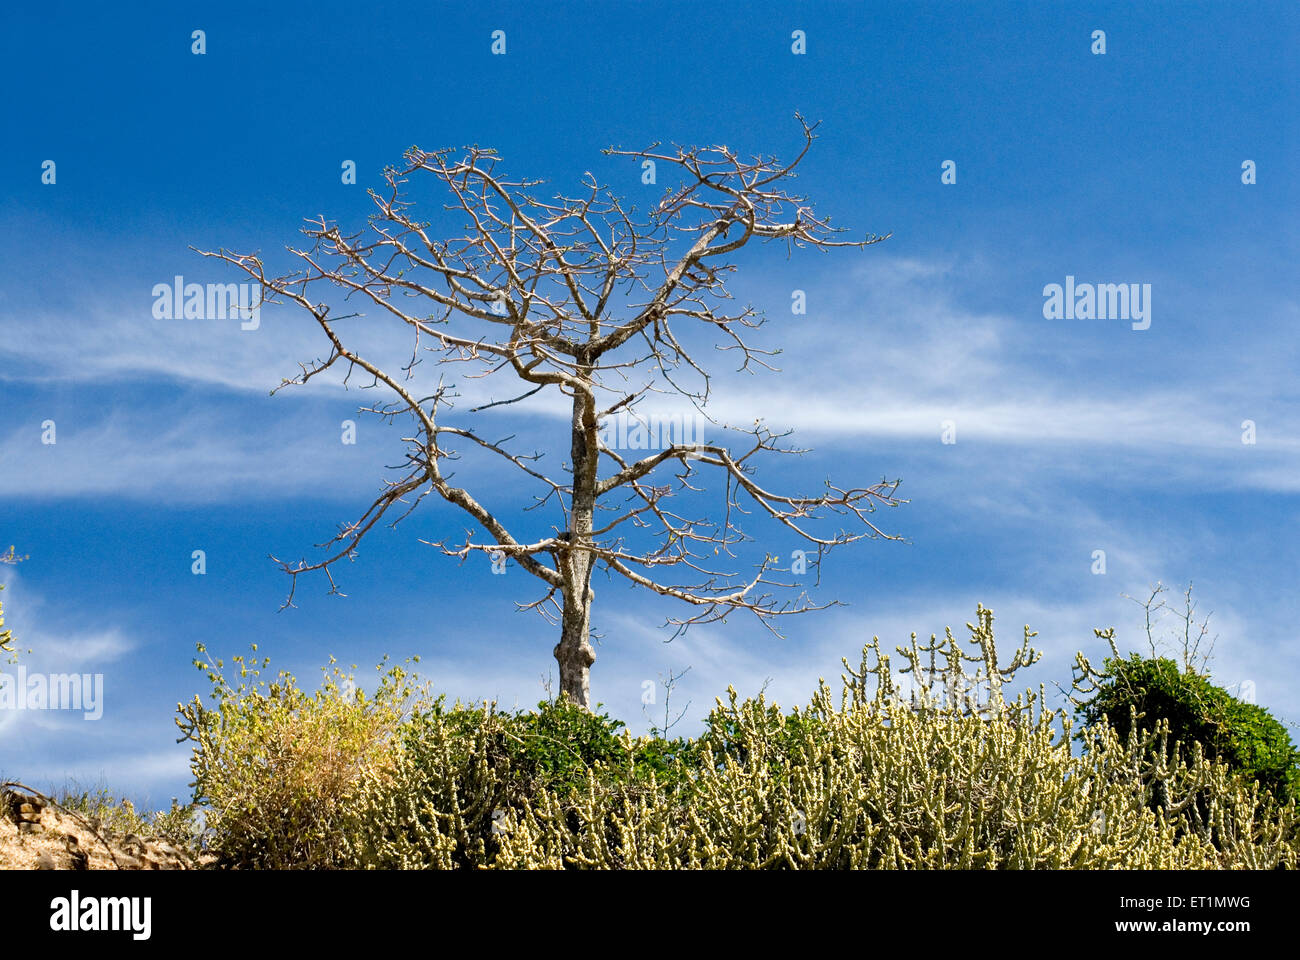 Leafless tree of silk cotton and cactus at Gavilgad fort at Chikhaldara ; district Amravati ; Maharashtra ; India - Stock Image